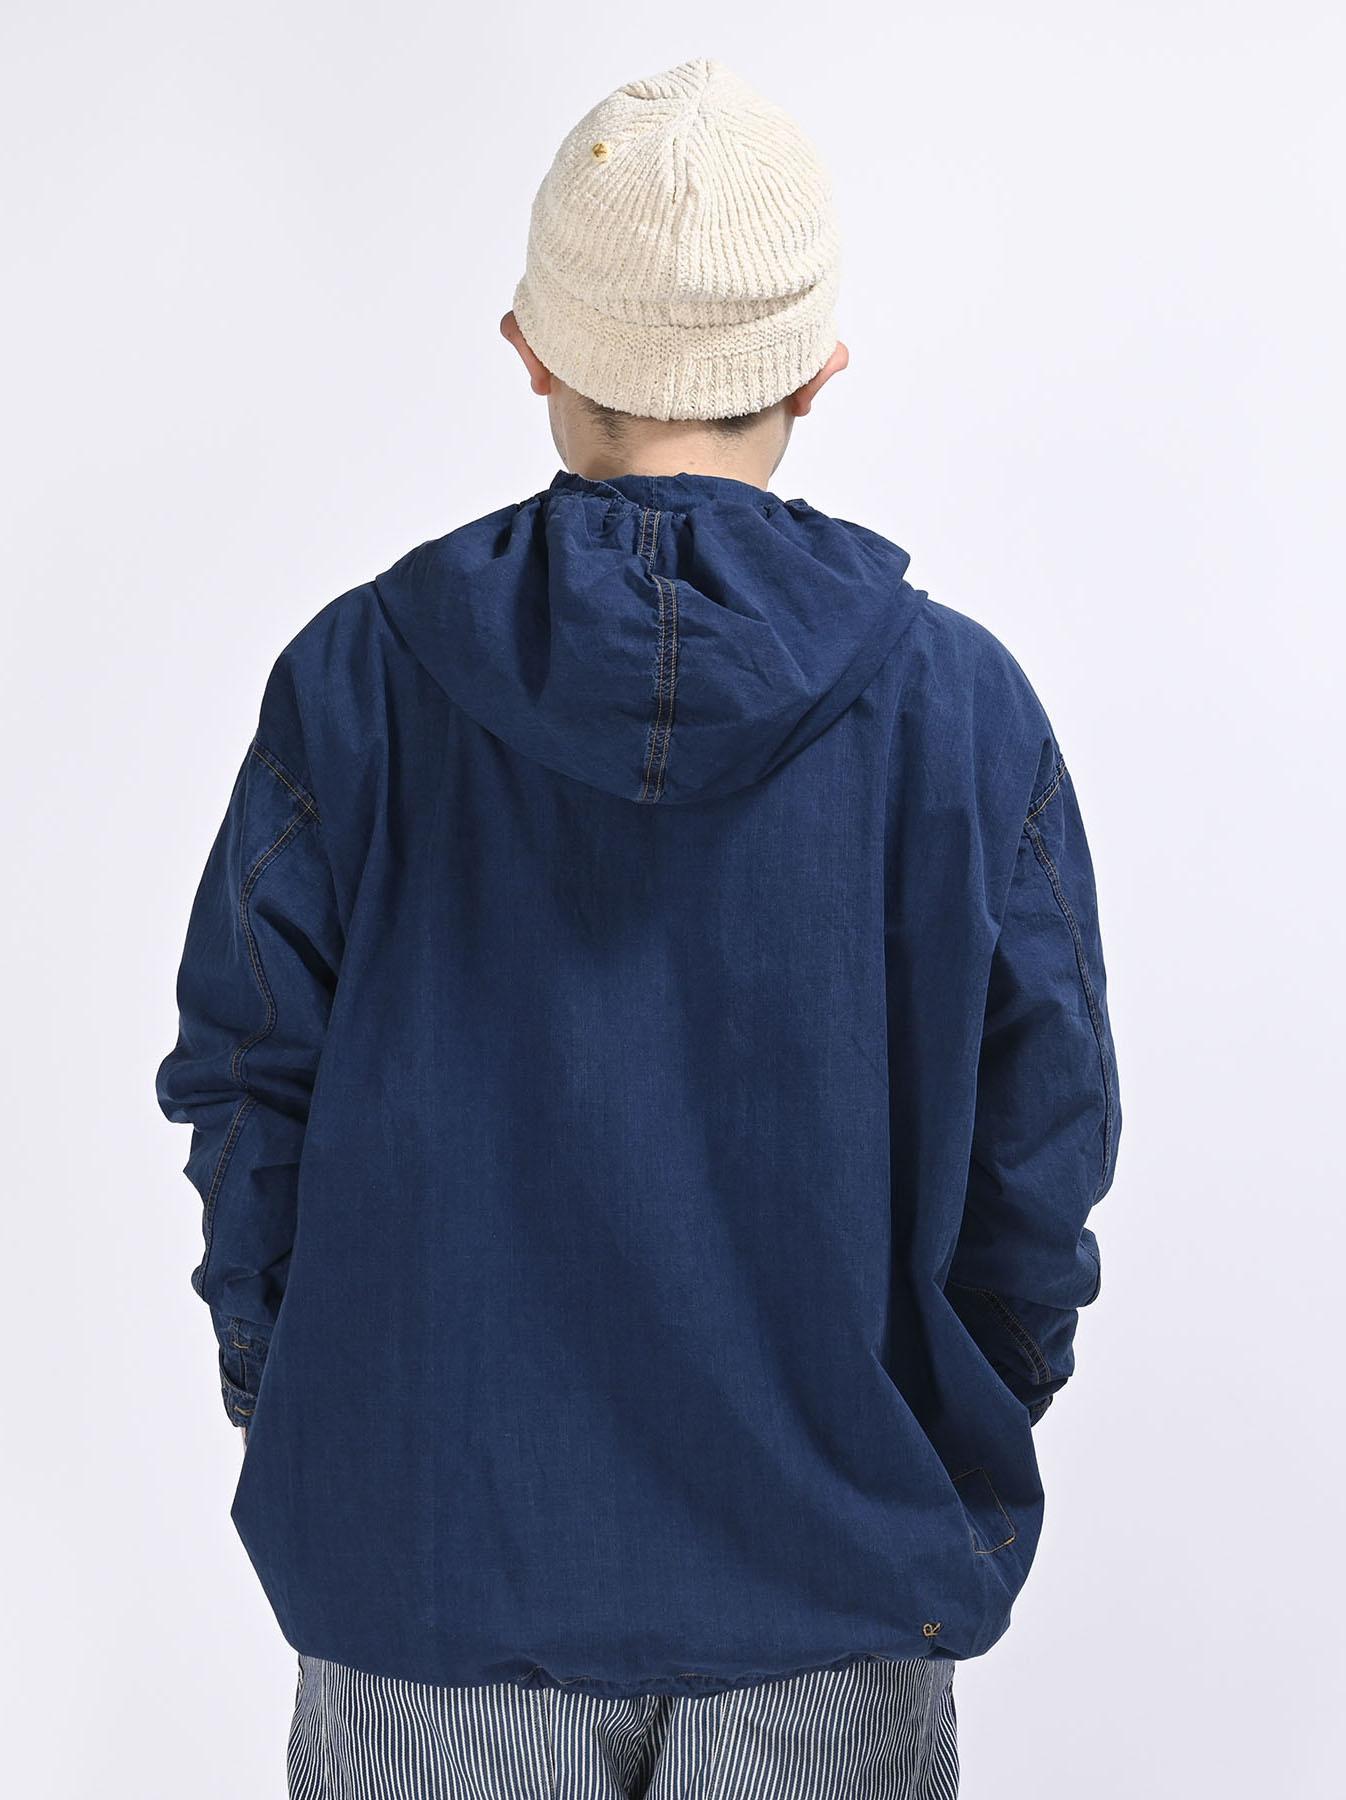 Indigo Tapet Damo Cotton On The Beach Hoodie Shirt-9